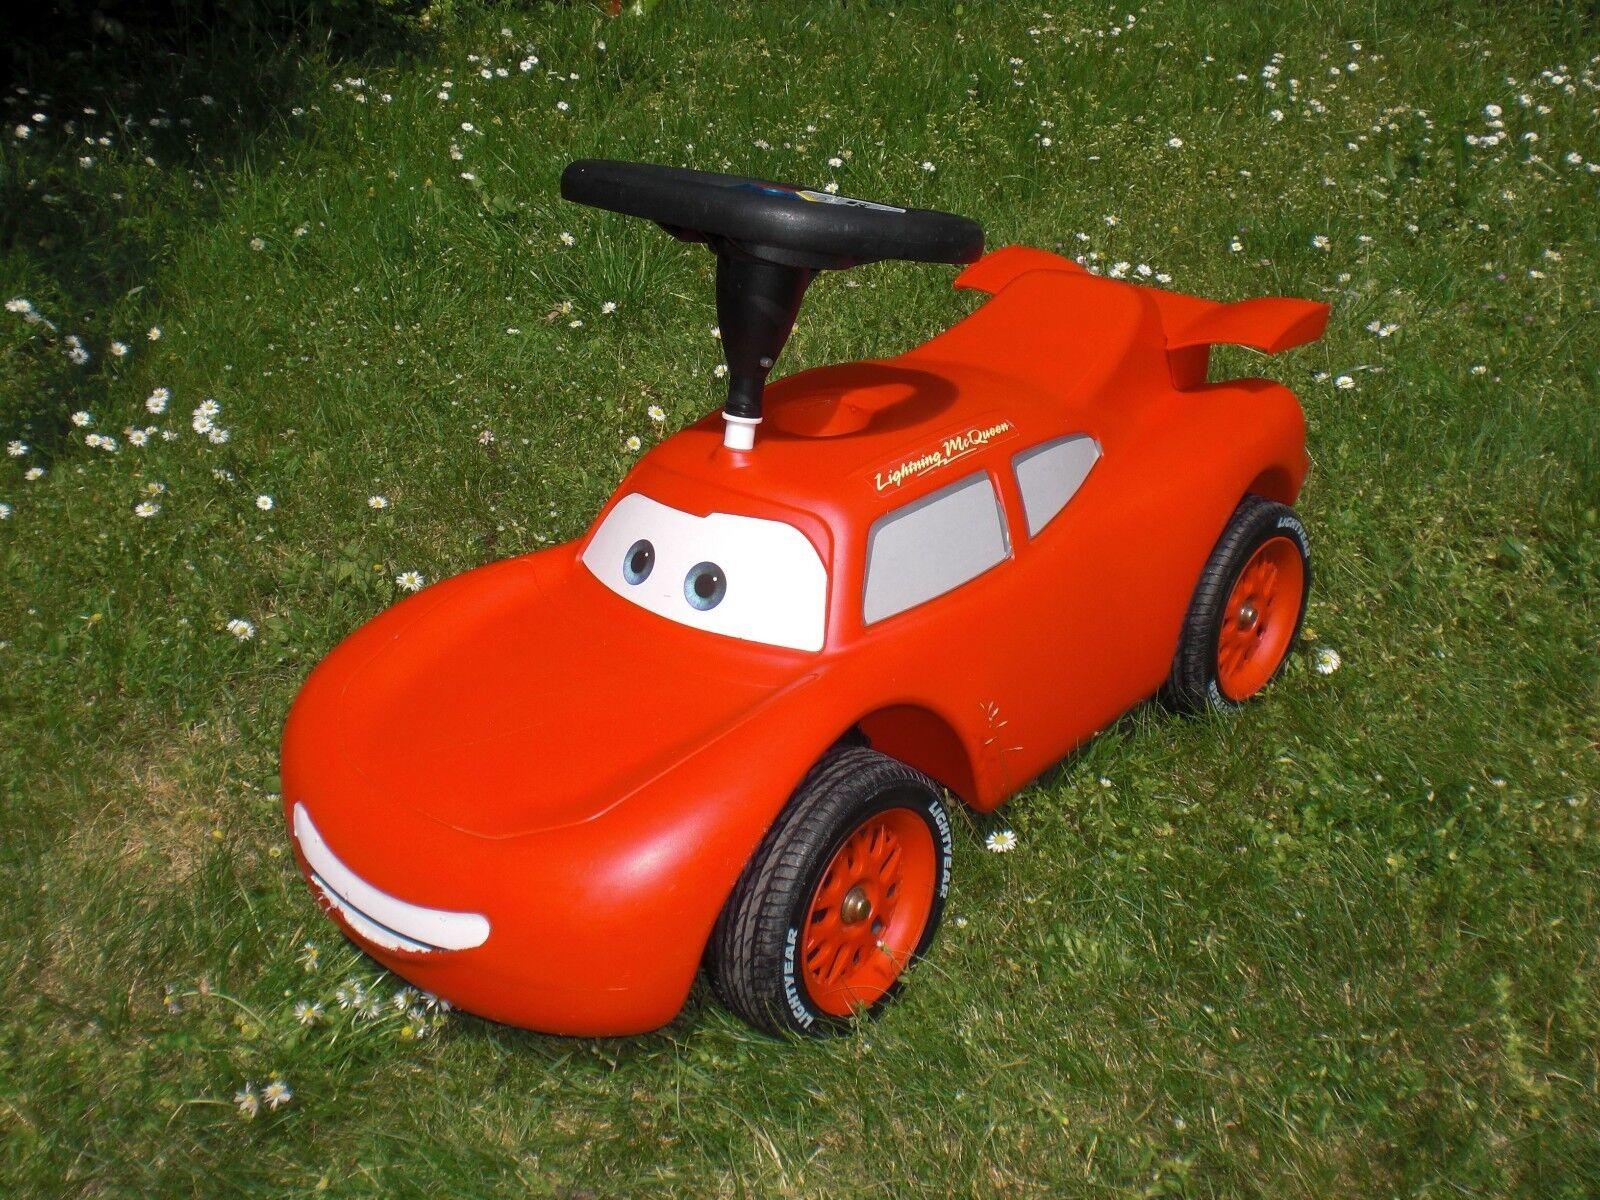 BIG Cars Lightning Mc Queen rot - Rutscher Auto Auto Auto Rutscherauto Bobby Car f0d727